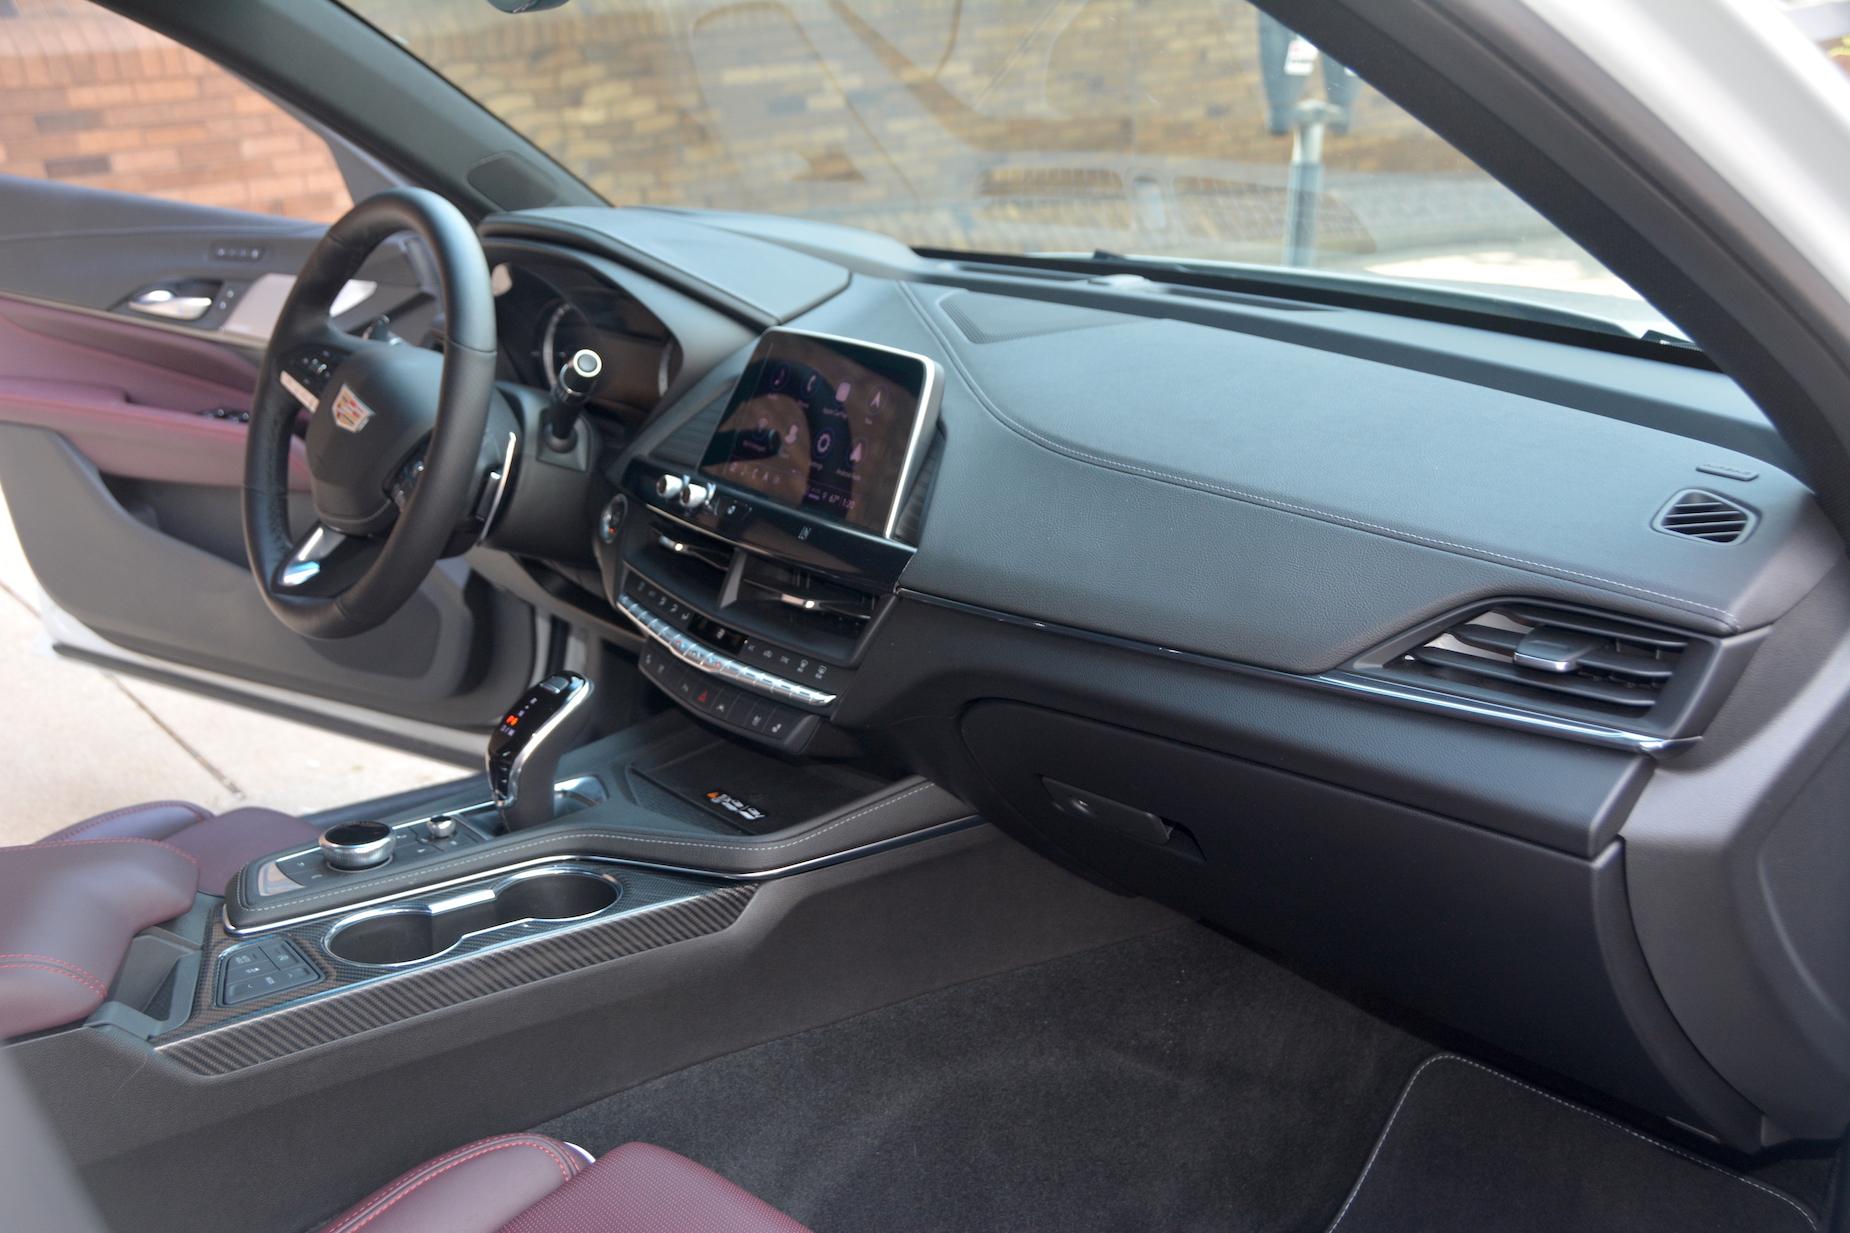 2021 Cadillac CT4-V interior